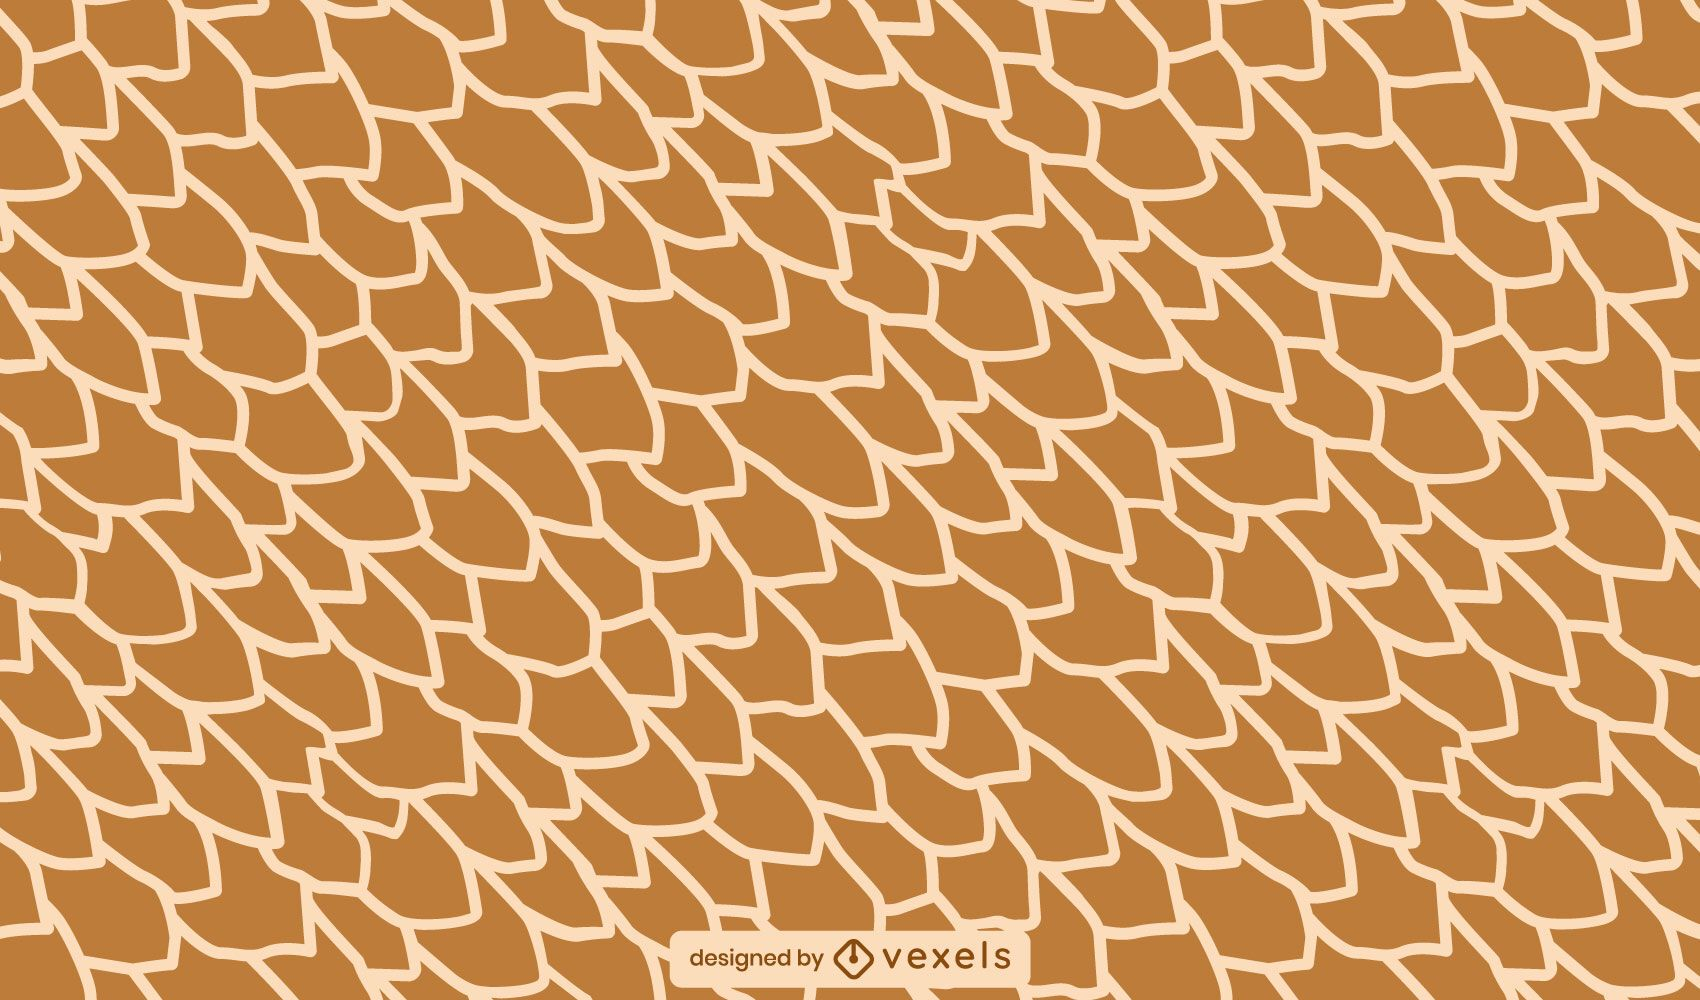 Giraffe skin pattern design